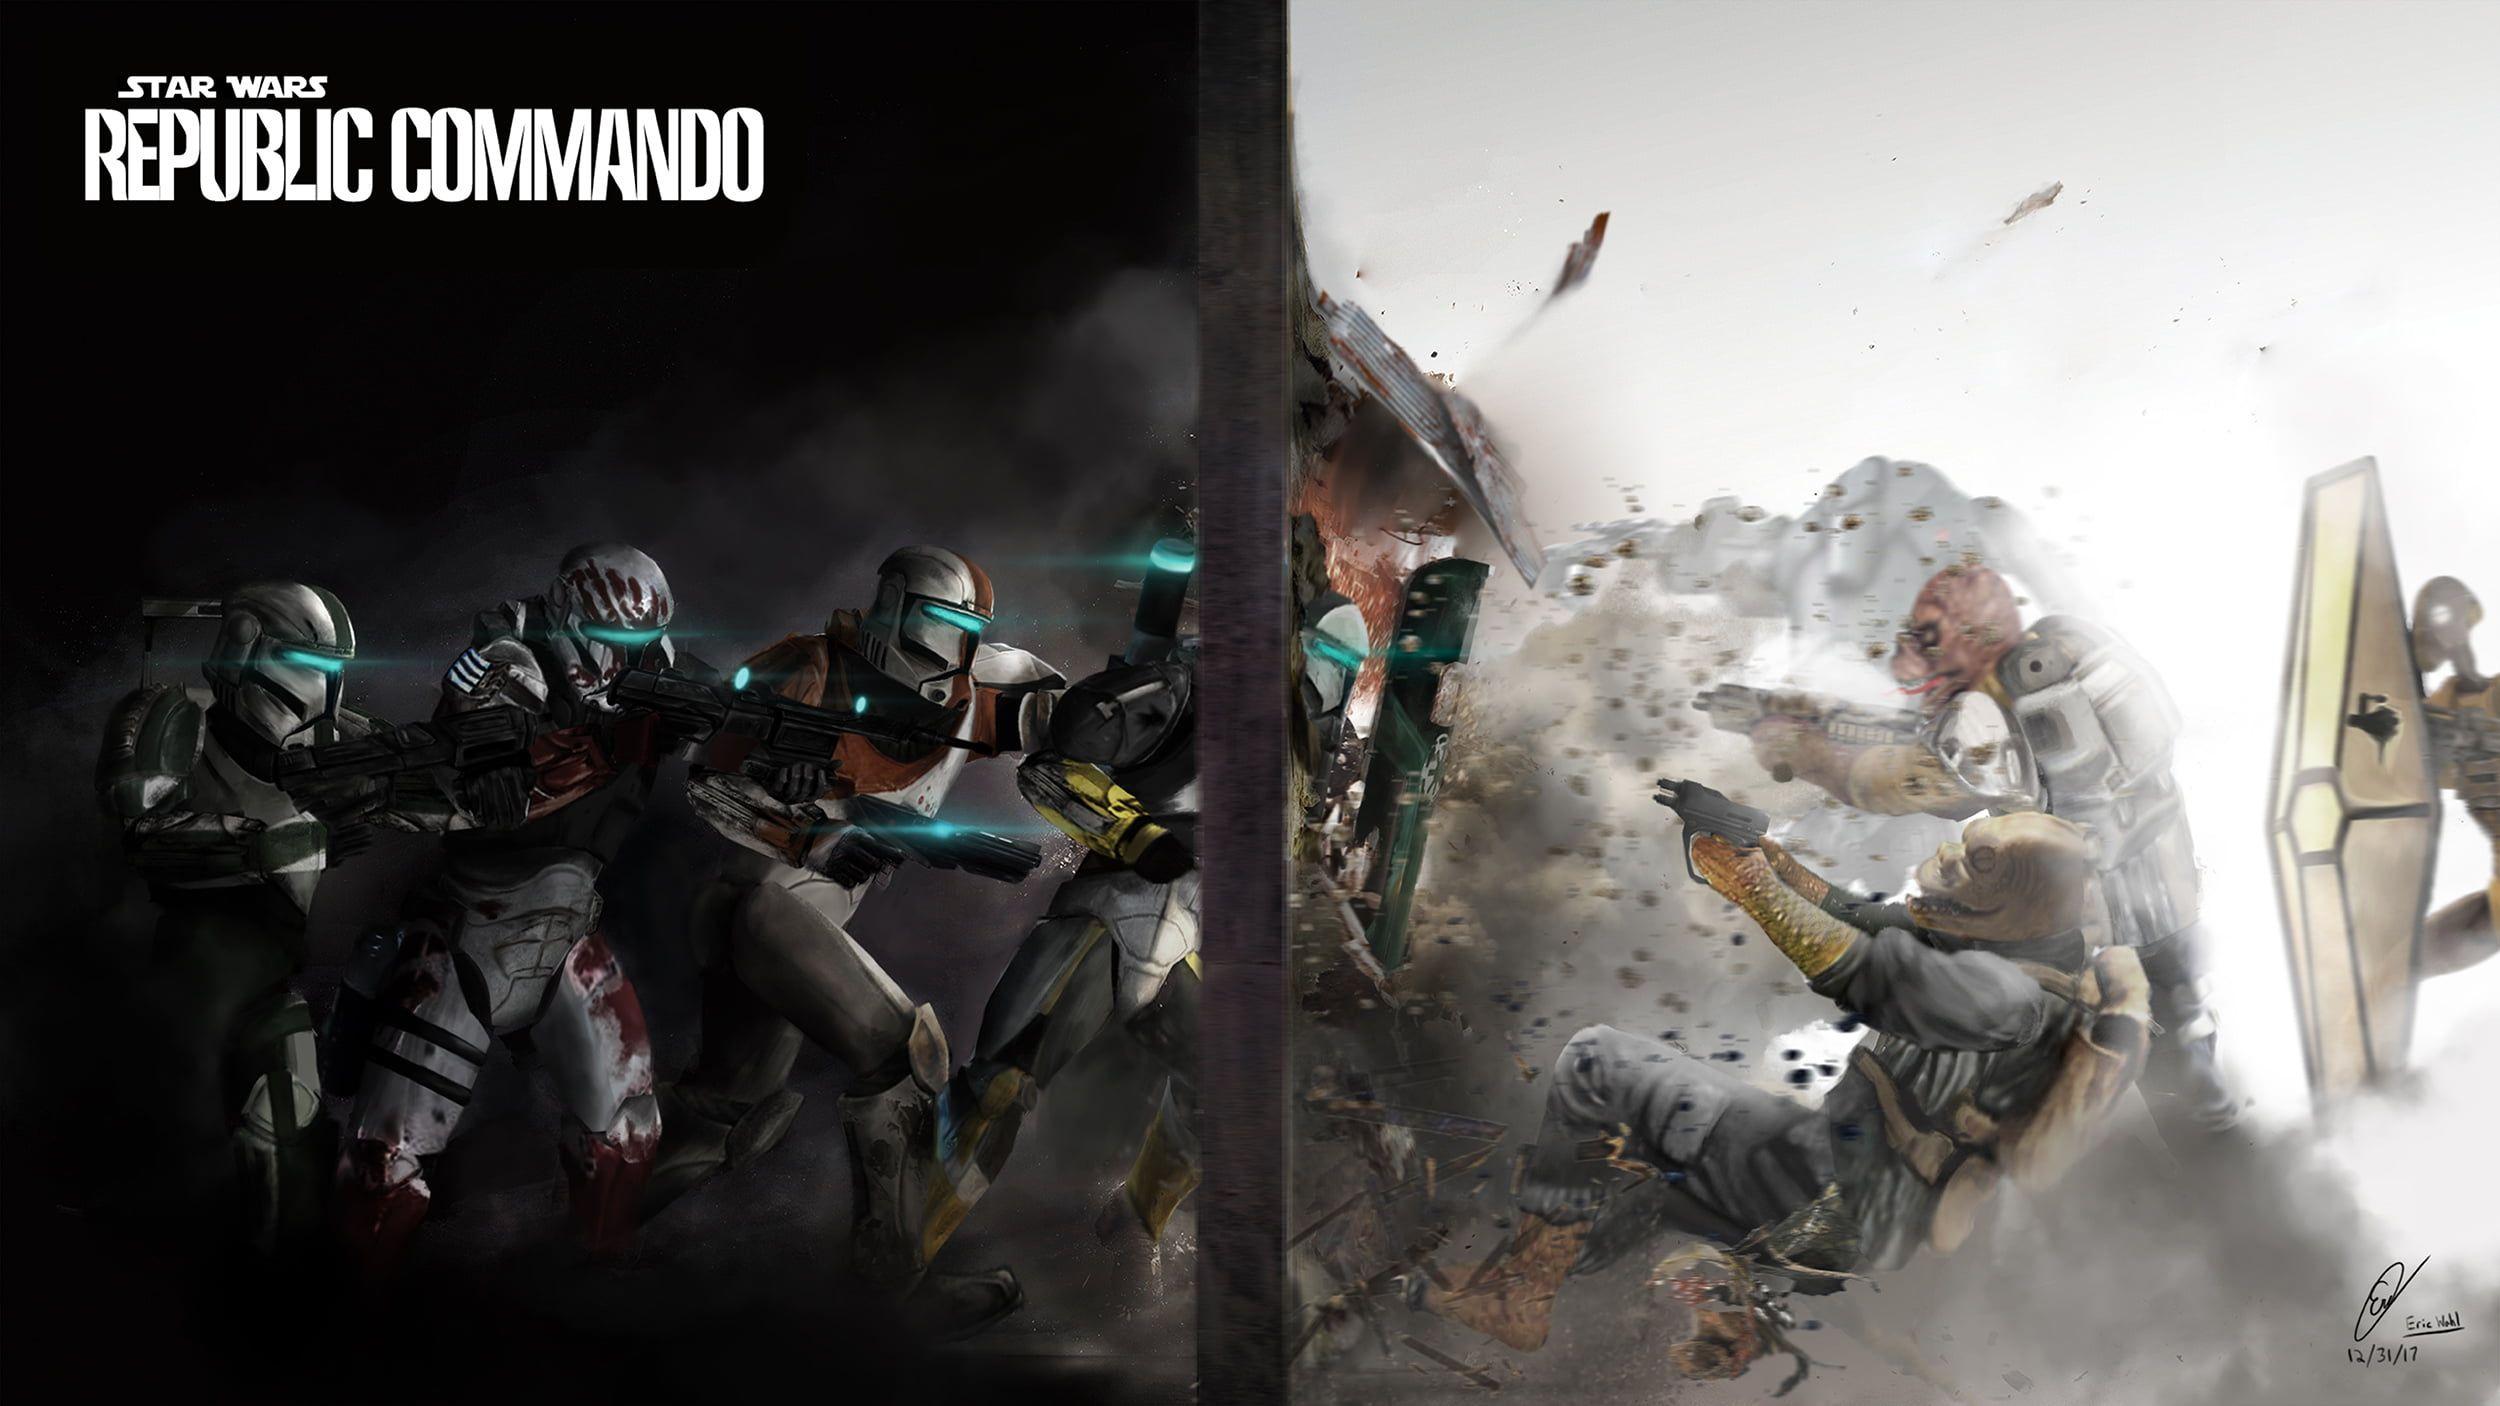 Star Wars Republic Commando Digital Wallpaper Video Games Rainbow